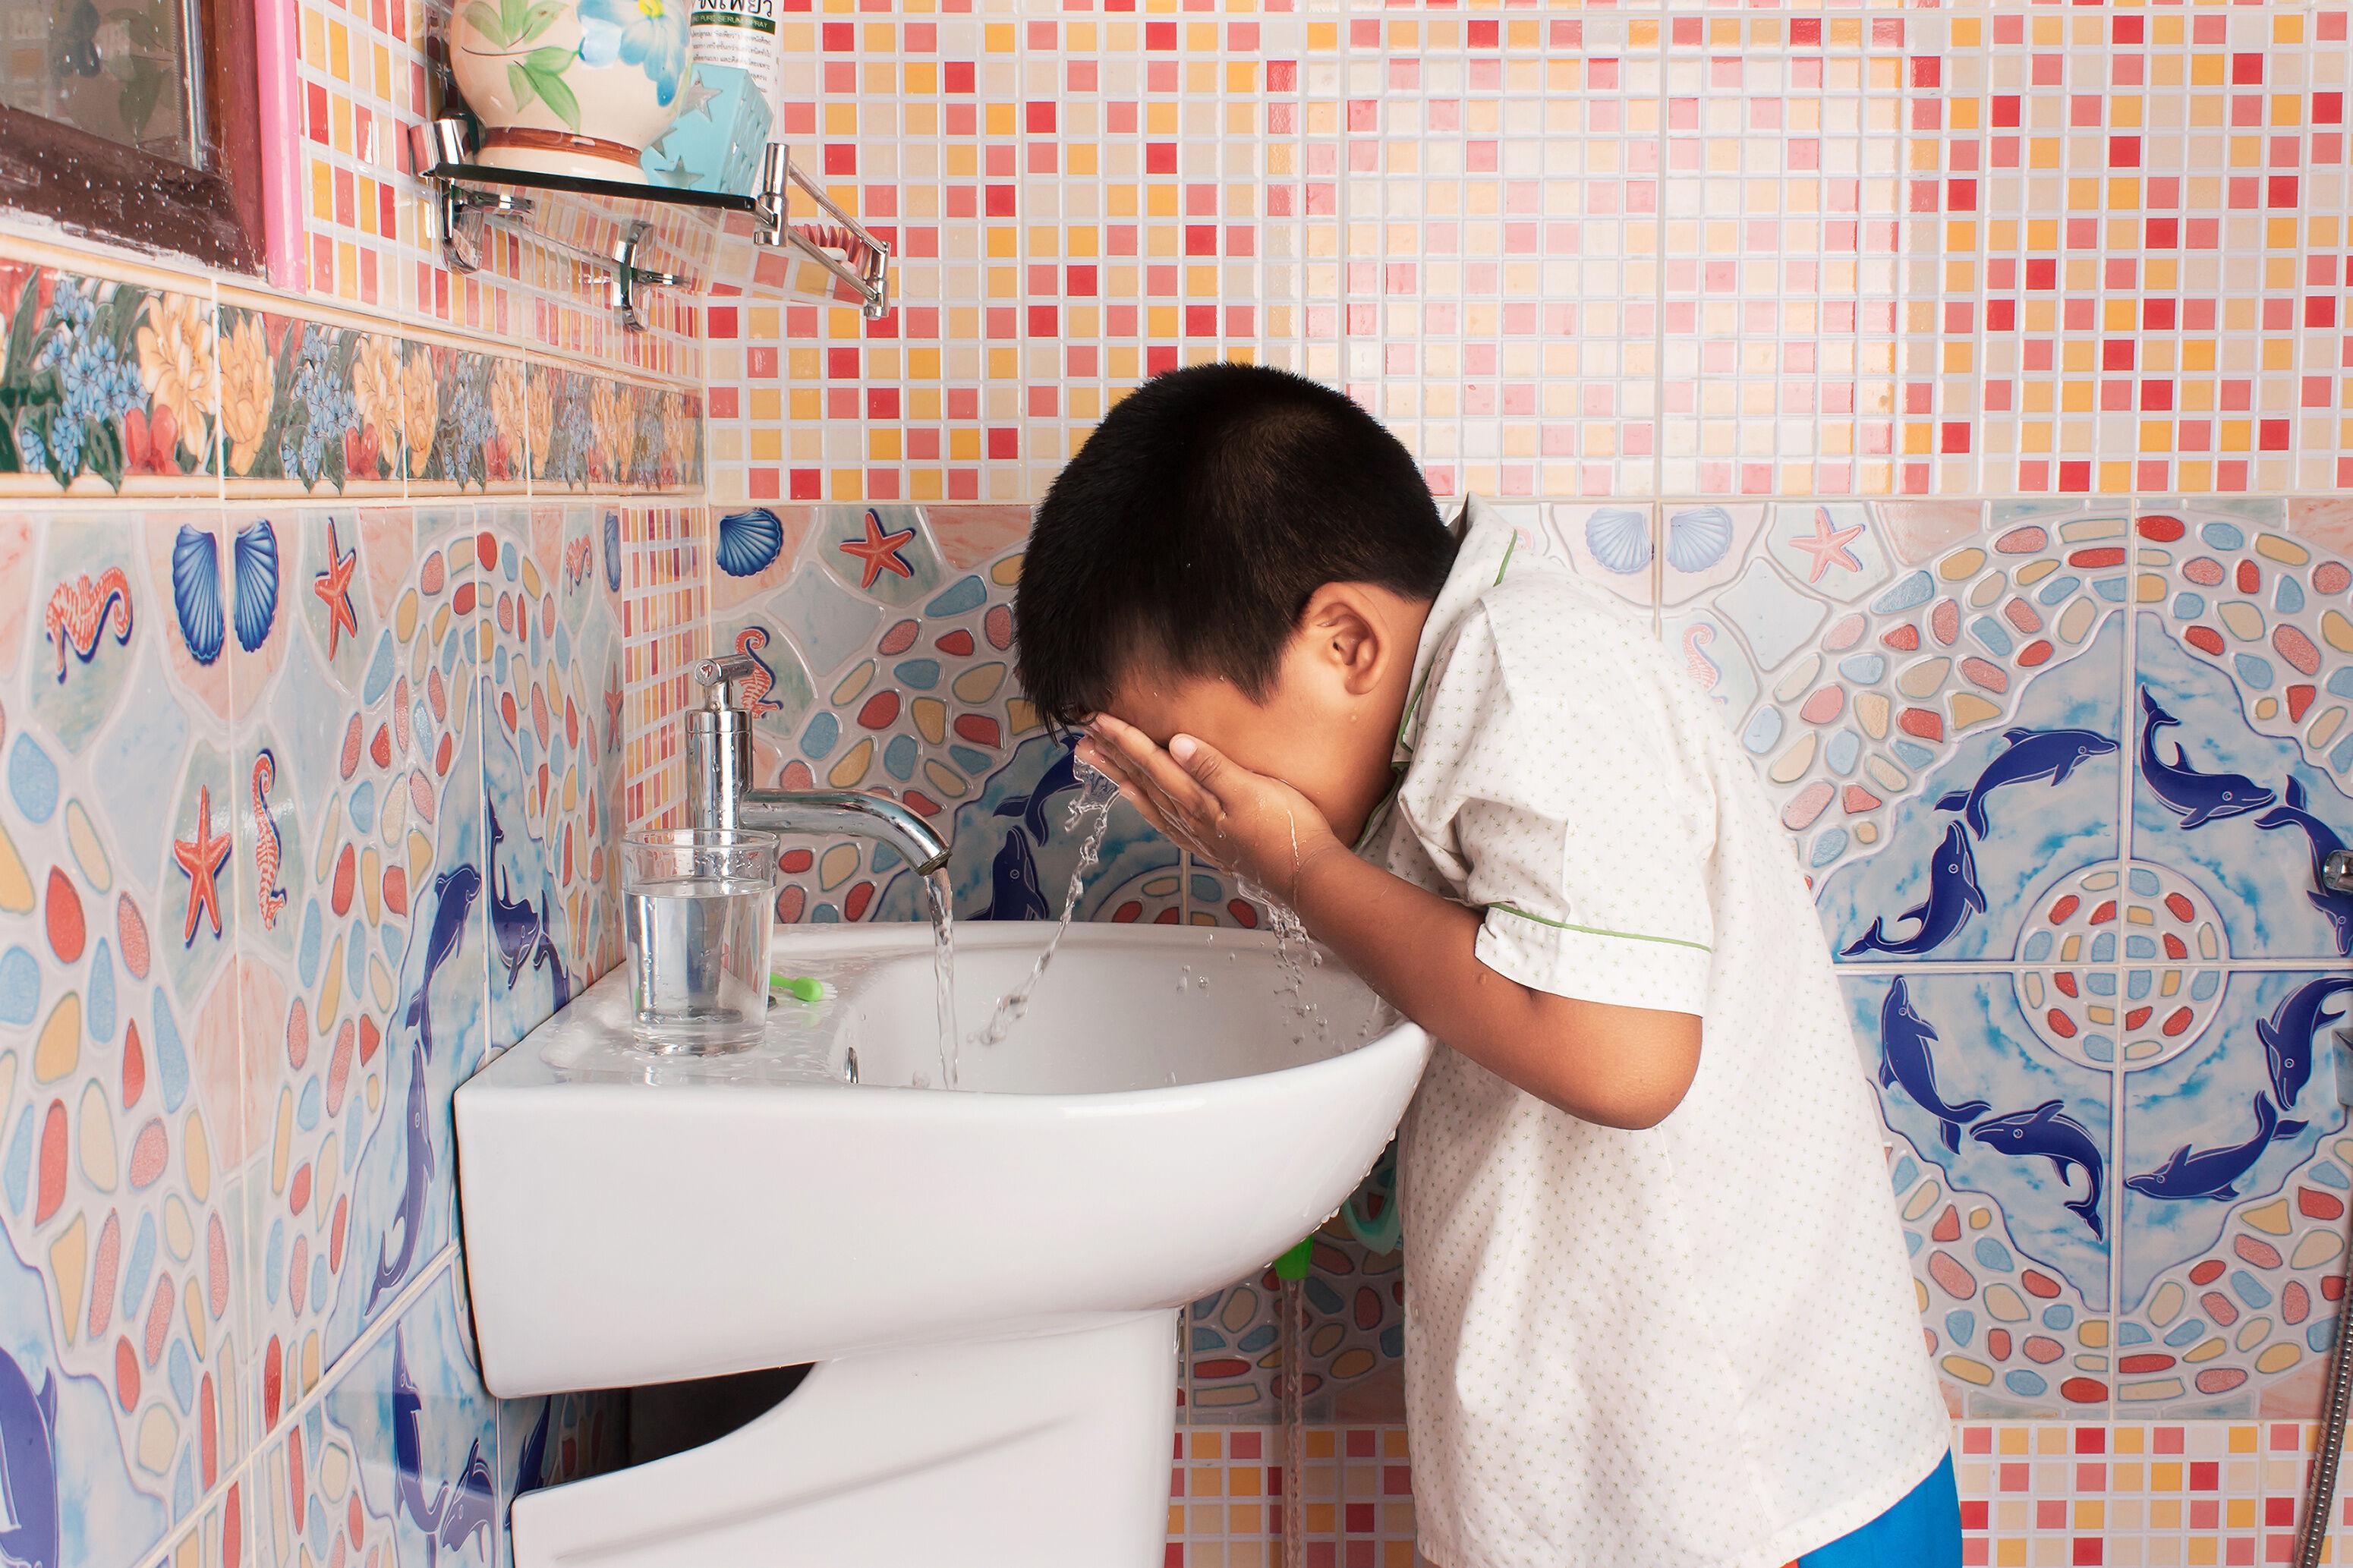 Boy washes his eyes